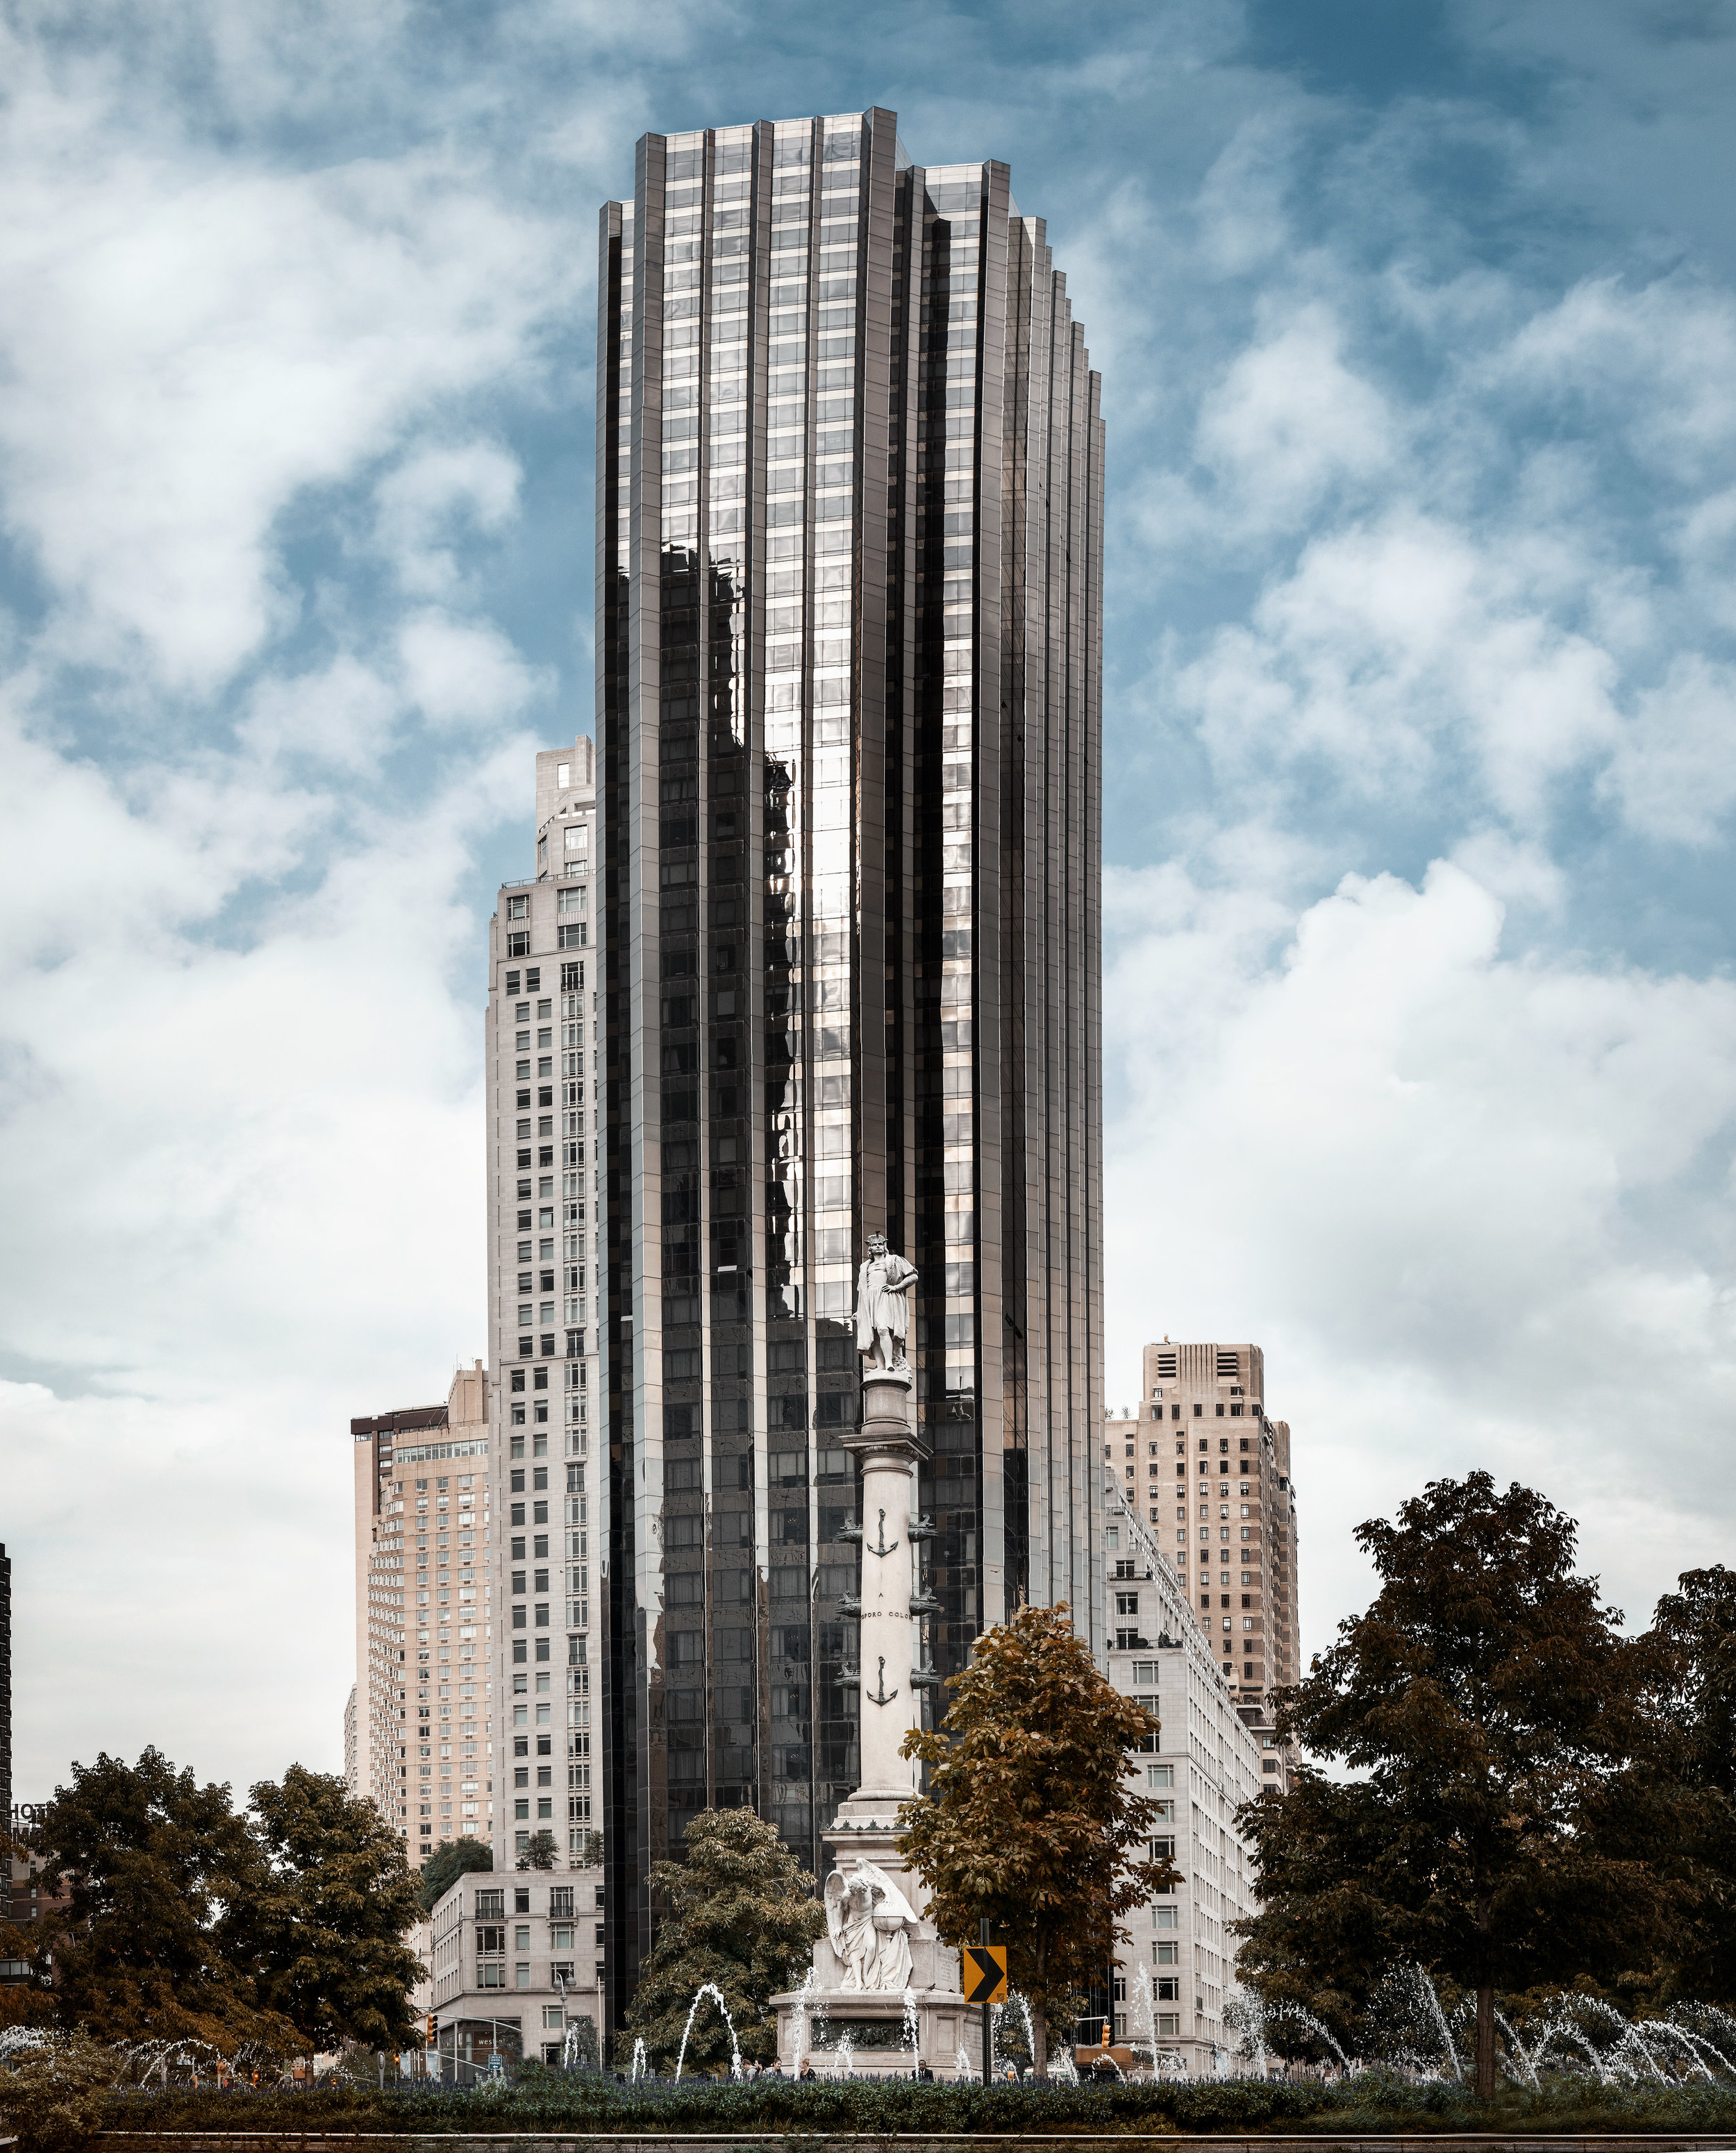 Trump International Hotel: New York, New York